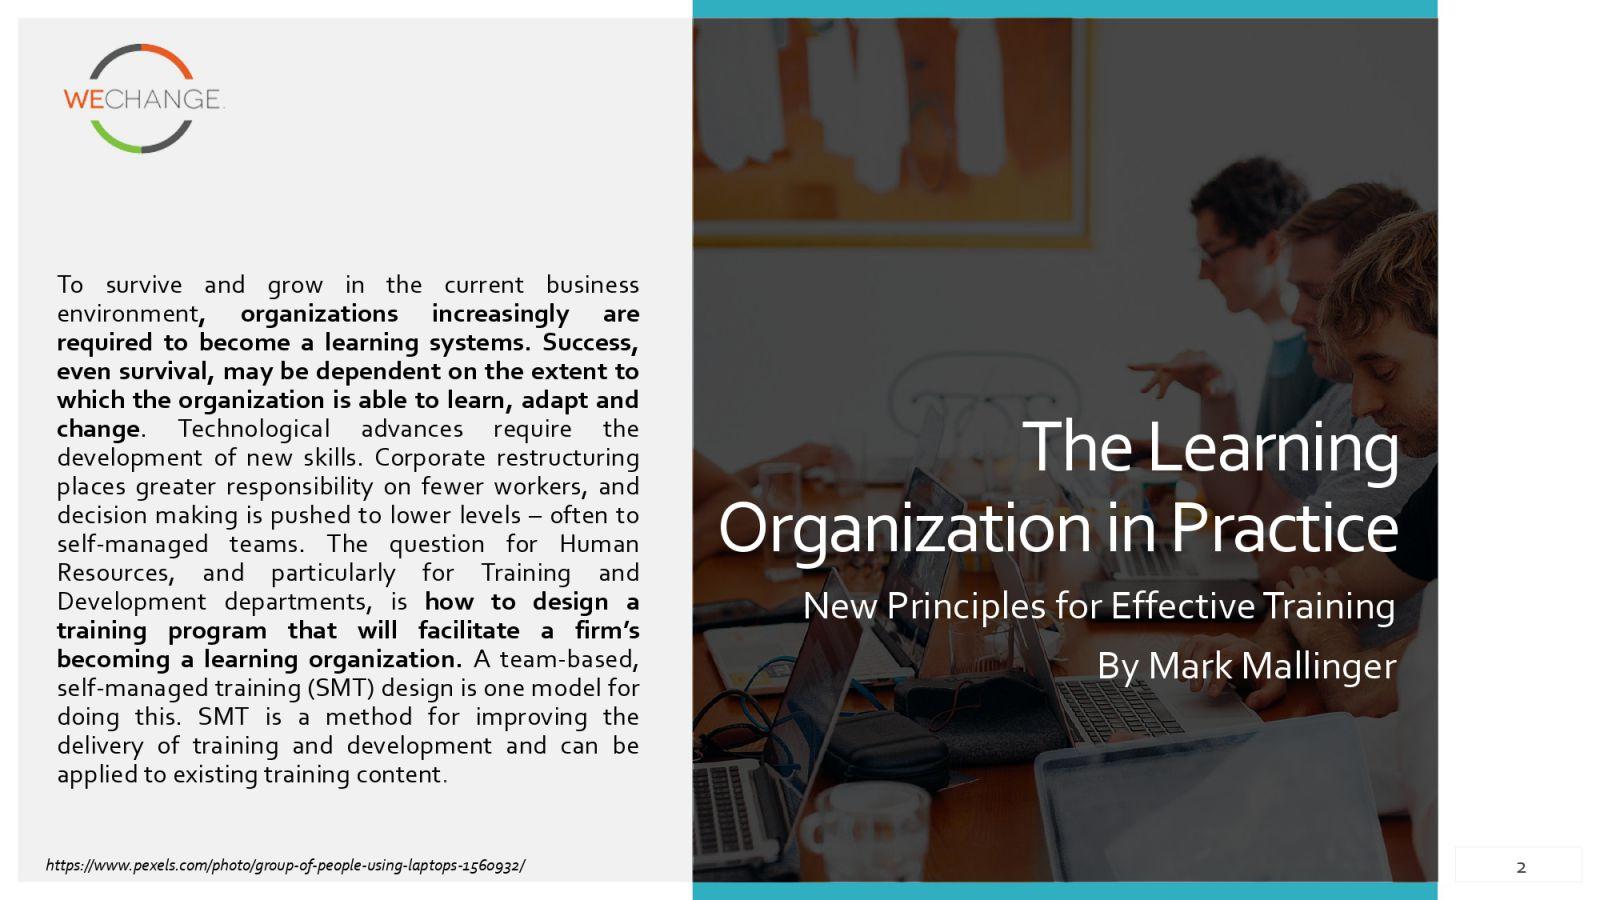 learnin organization in practice page 0002 compressed The learning organization in practice